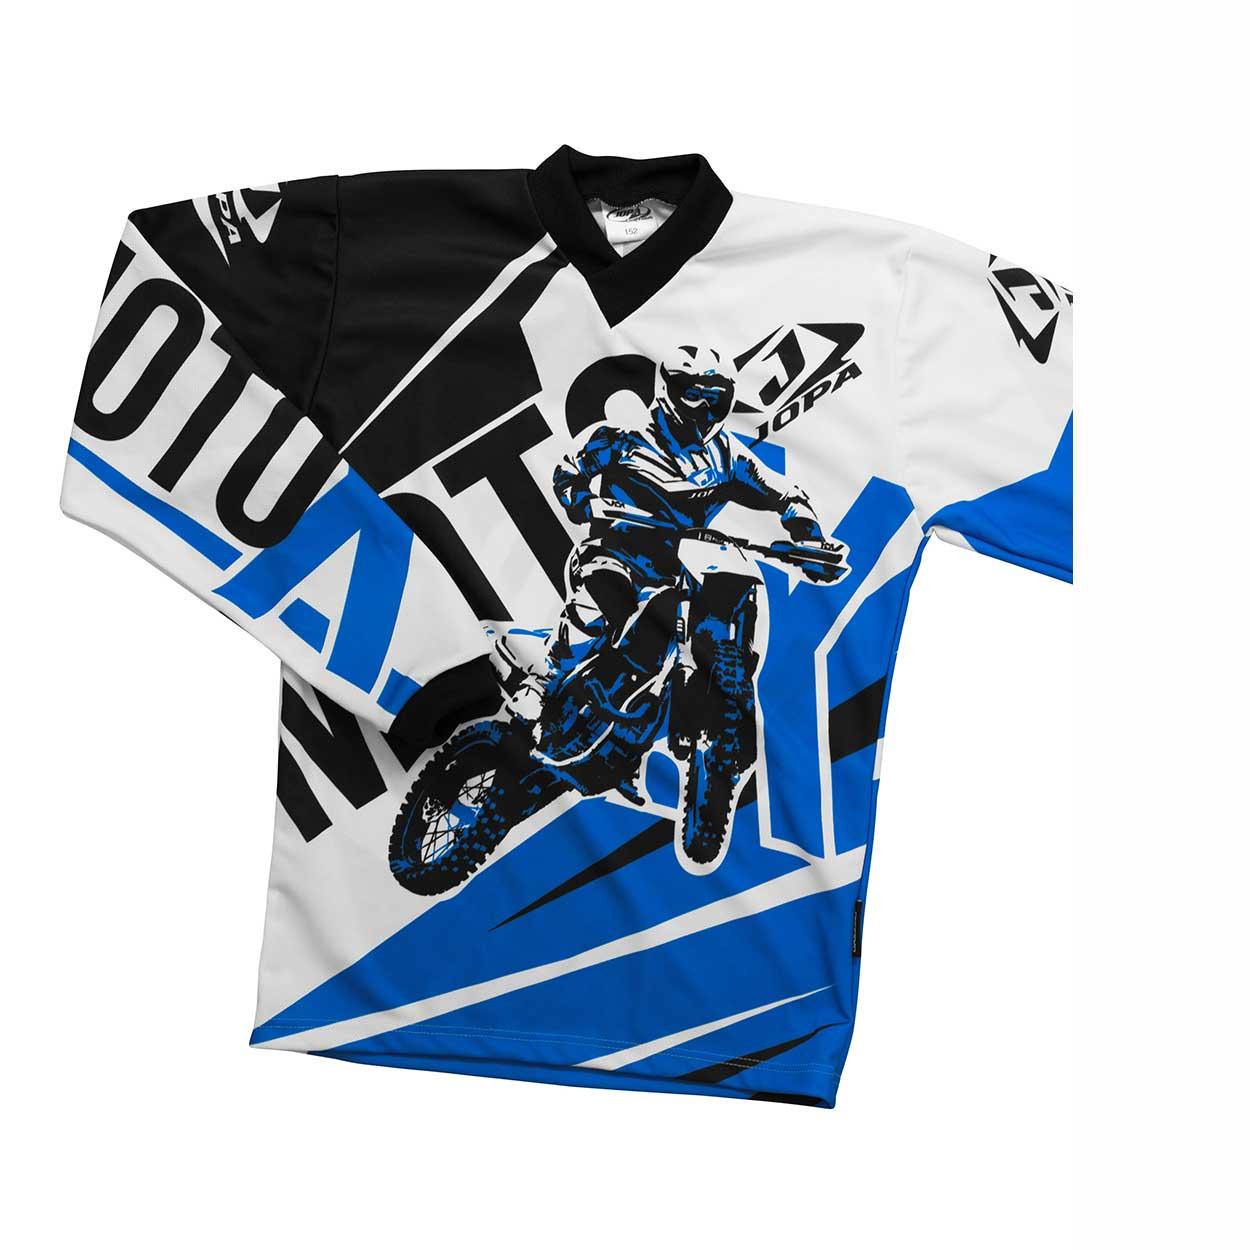 Jopa Kinder Shirt Moto-X Blue-74